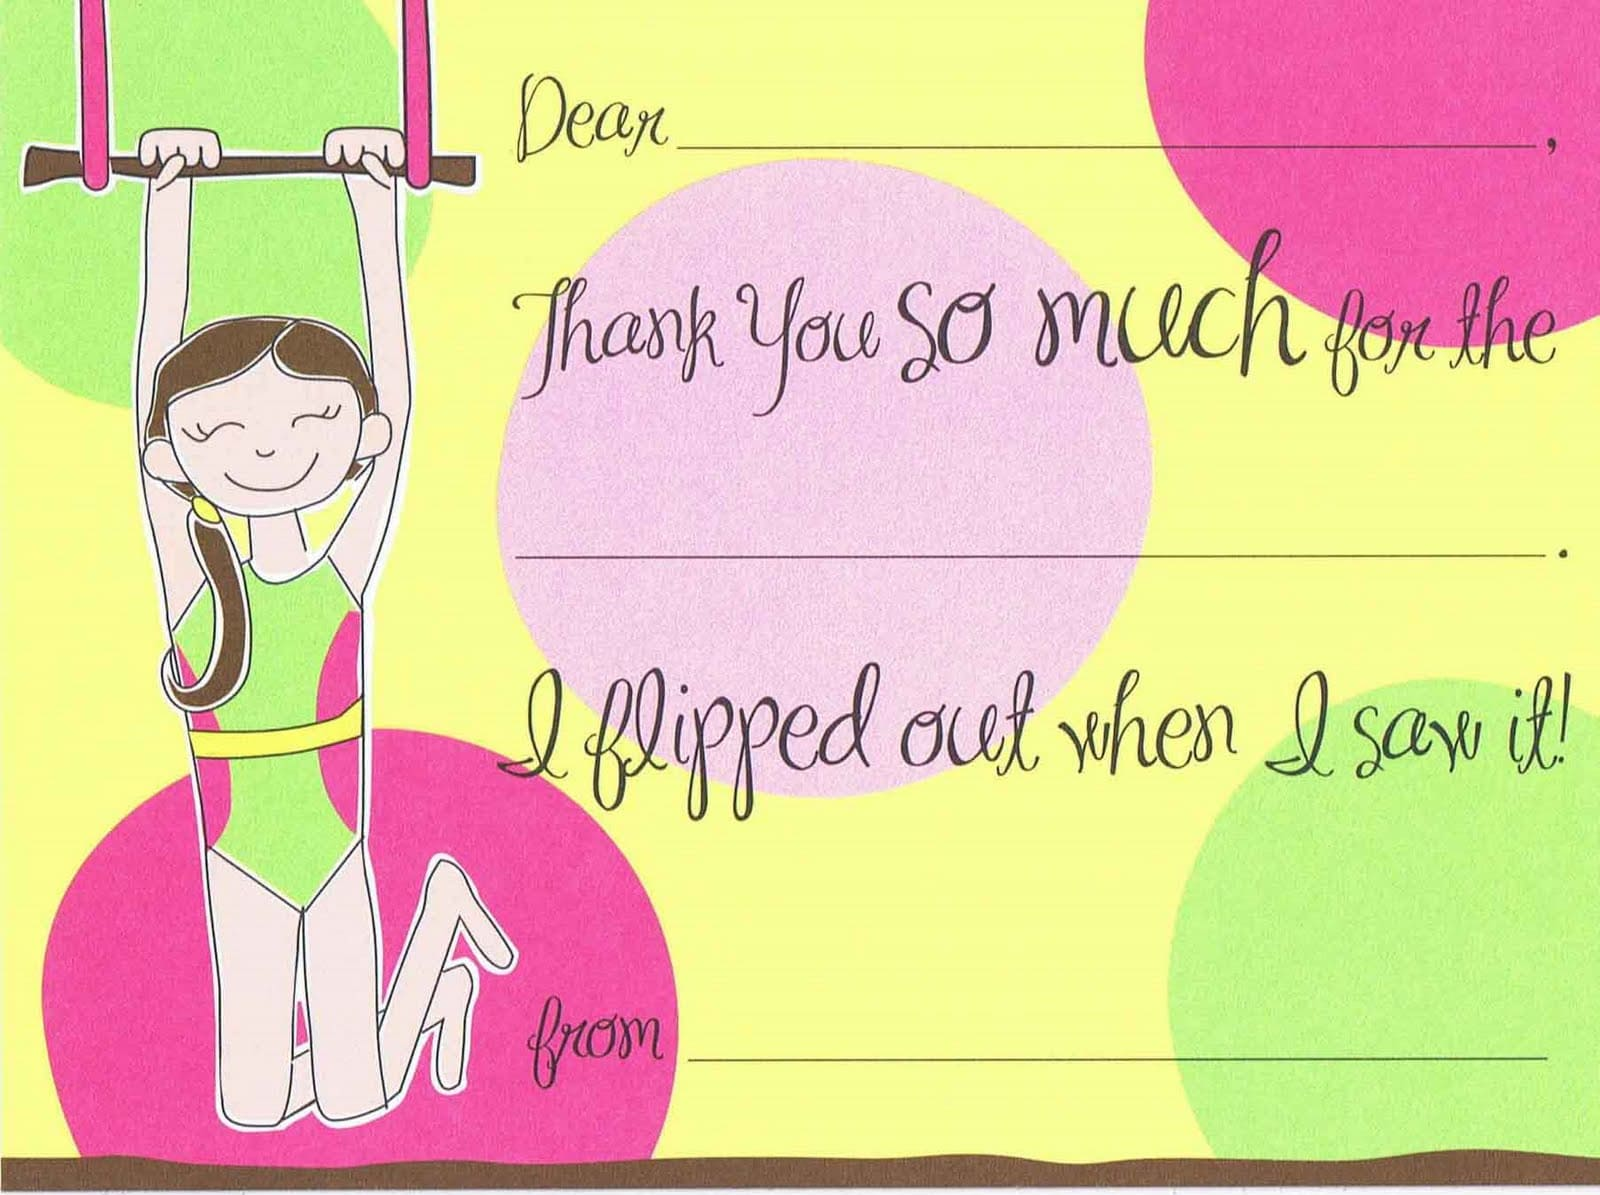 Gymnastics-themed birthday party thank-you card